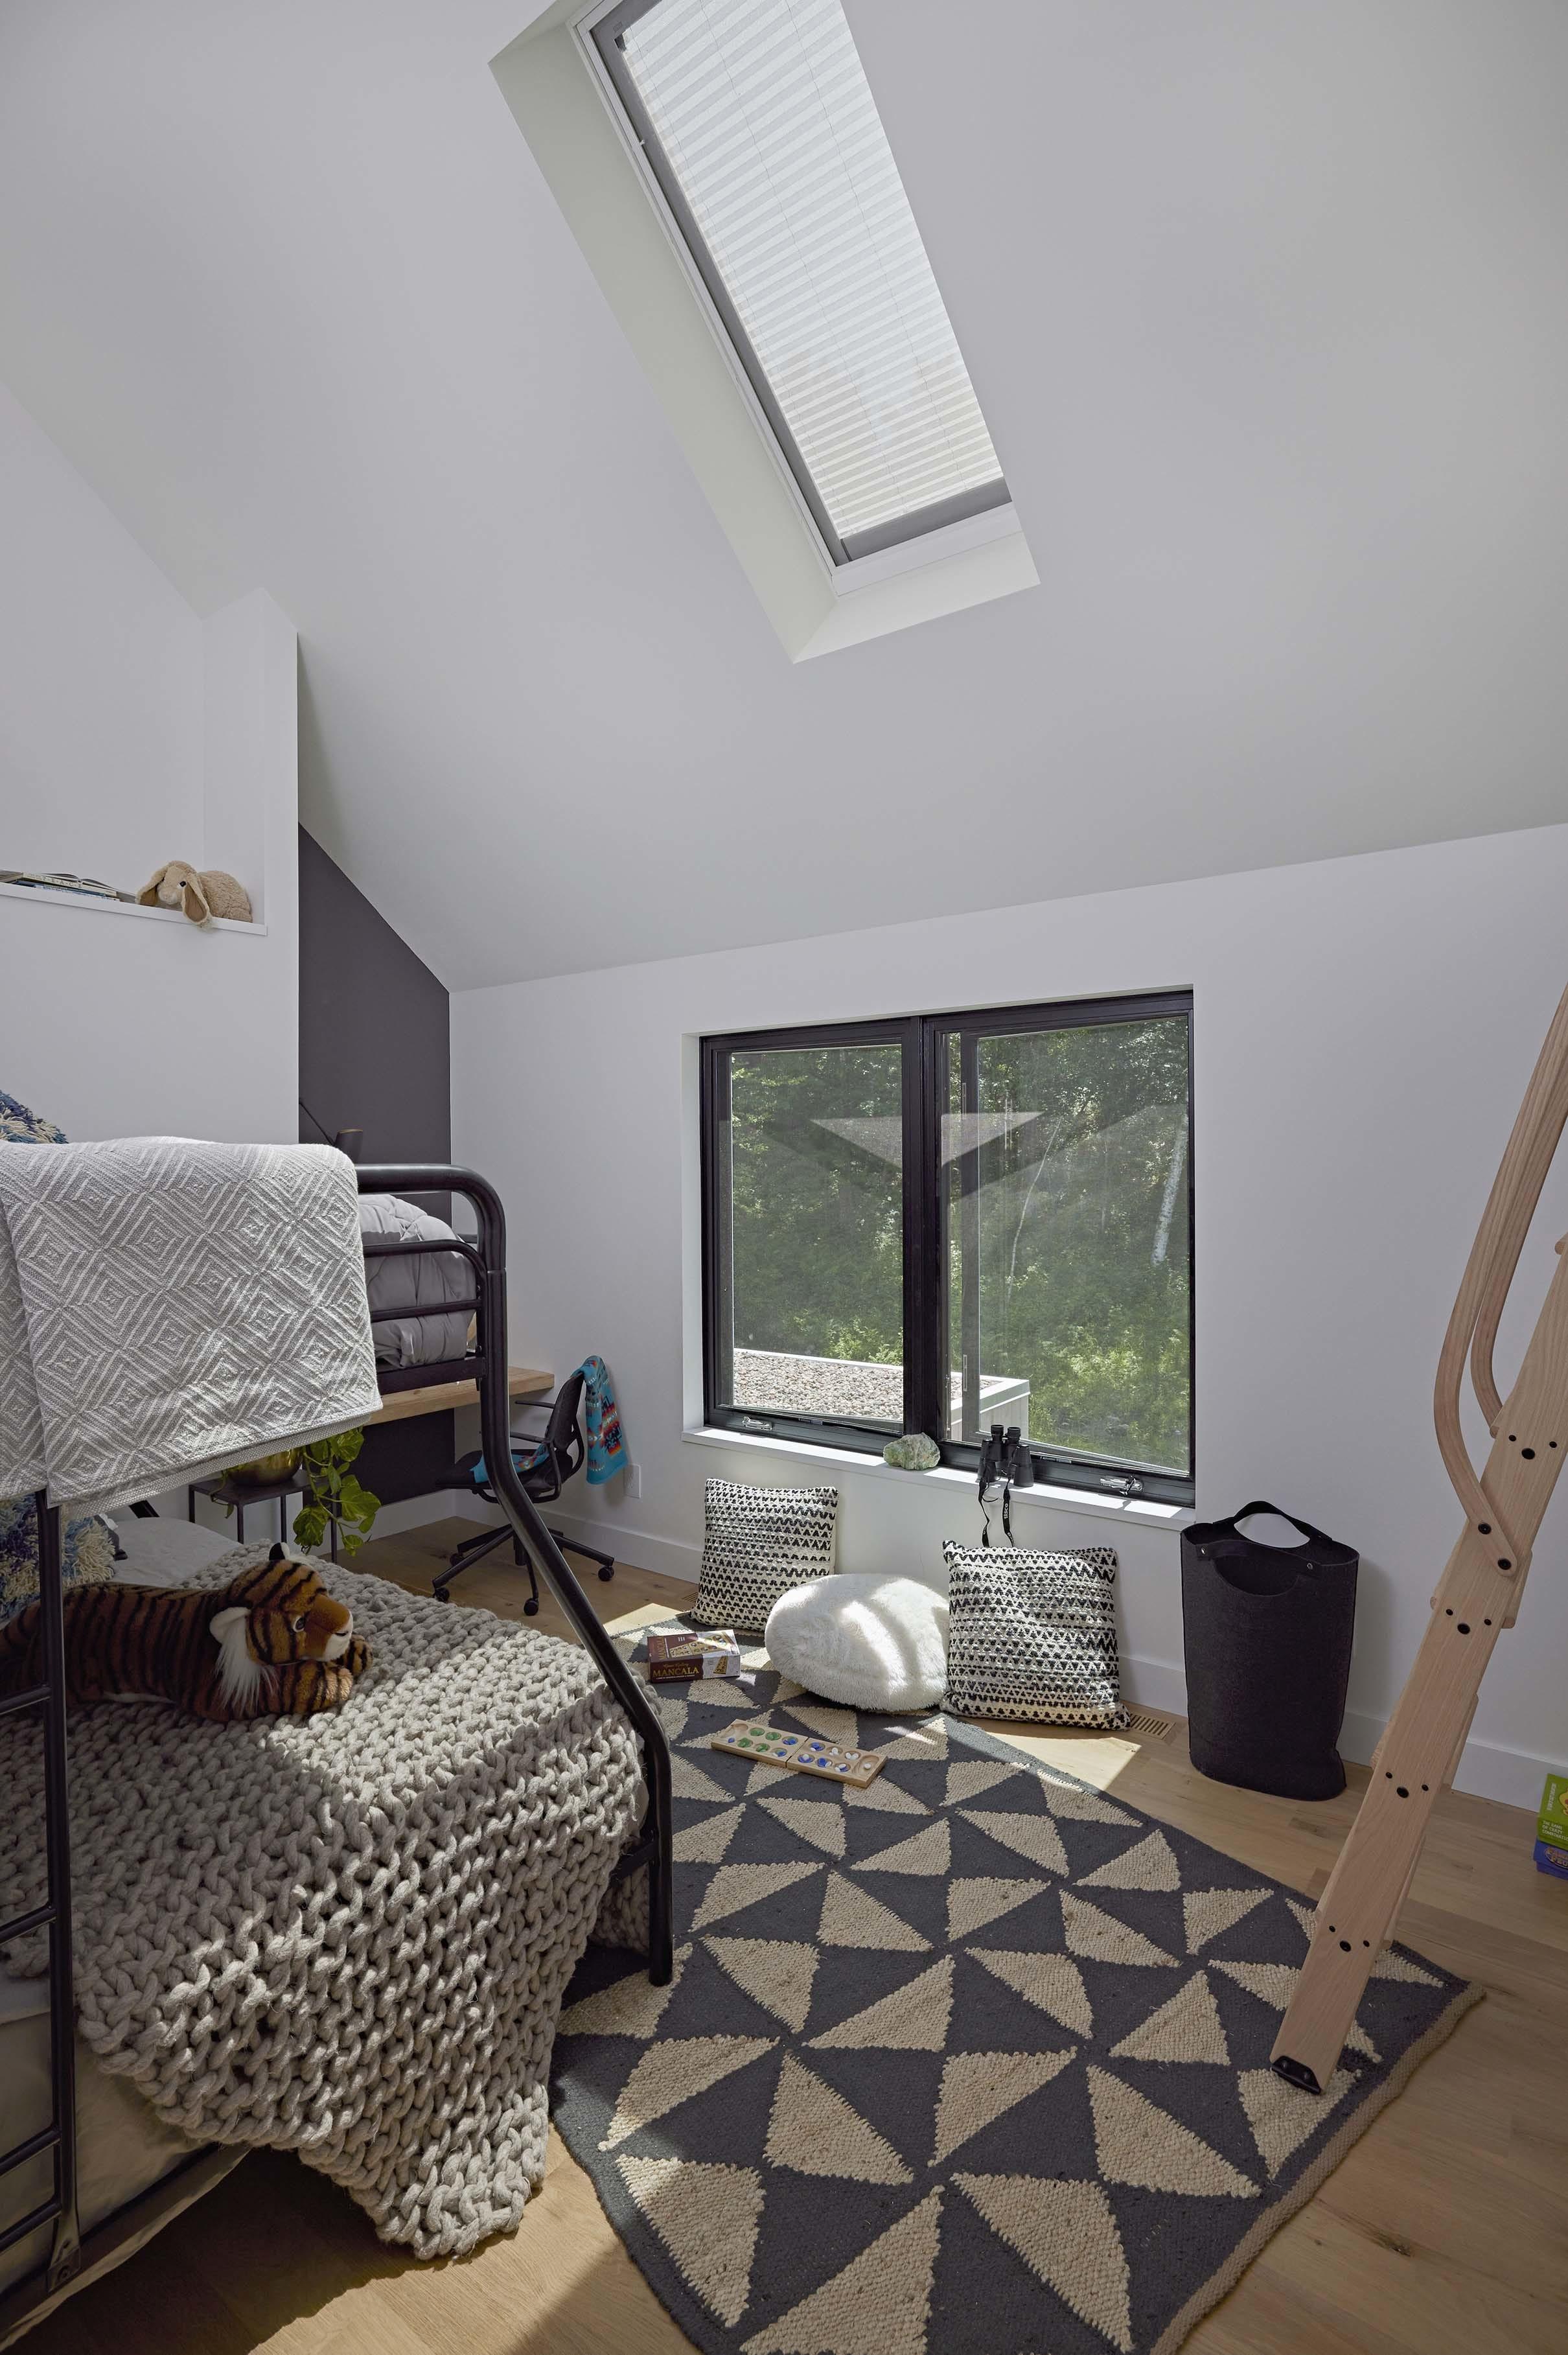 Bedroom skylight shades closed